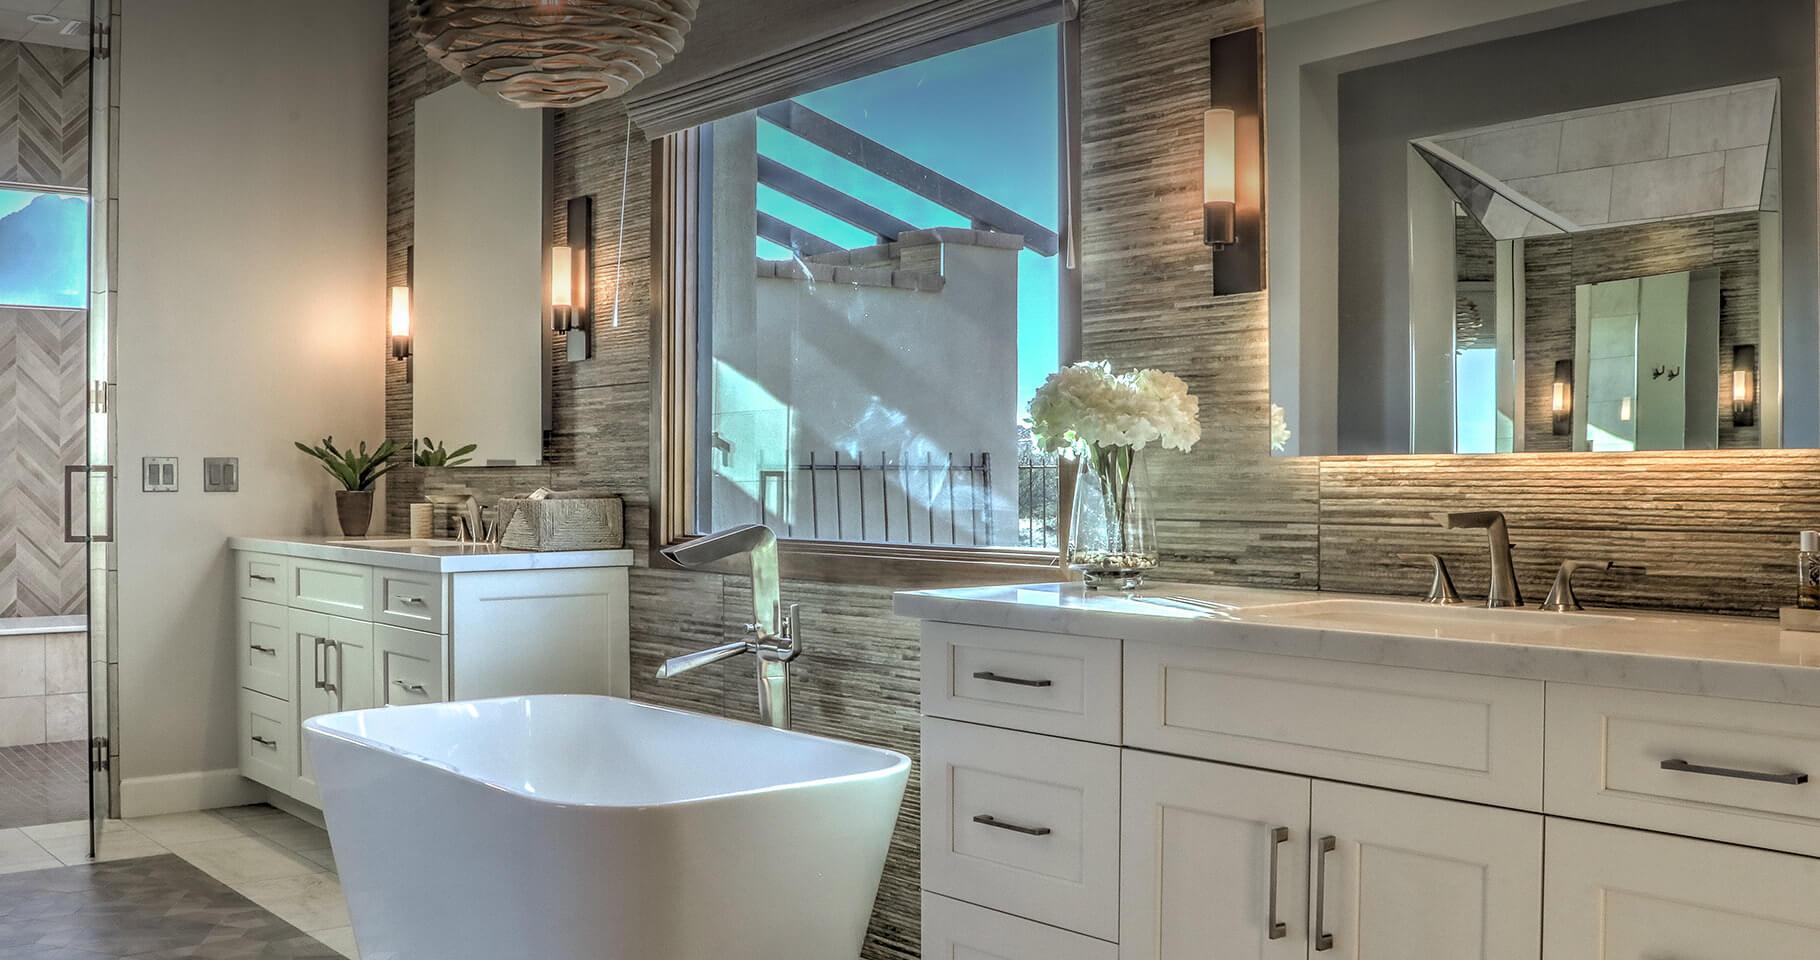 Kitchen Cabinet Showroom & Scottsdale Kitchen u0026 Bath Cabinets u0026 Countertops in Scottsdale AZ